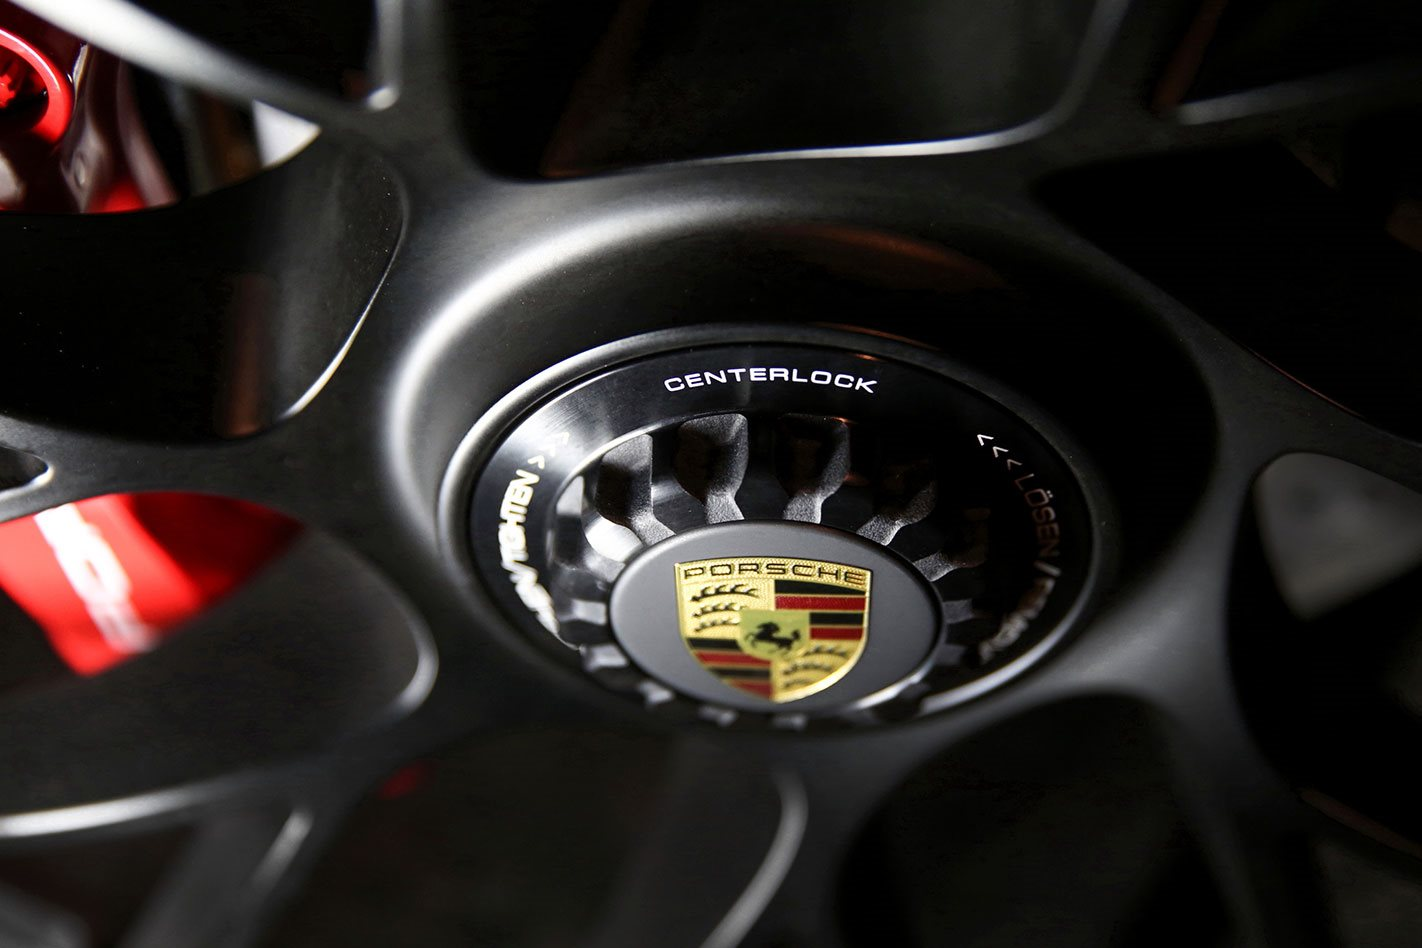 2018 Porsche 991.2 911 GTS Centrelock